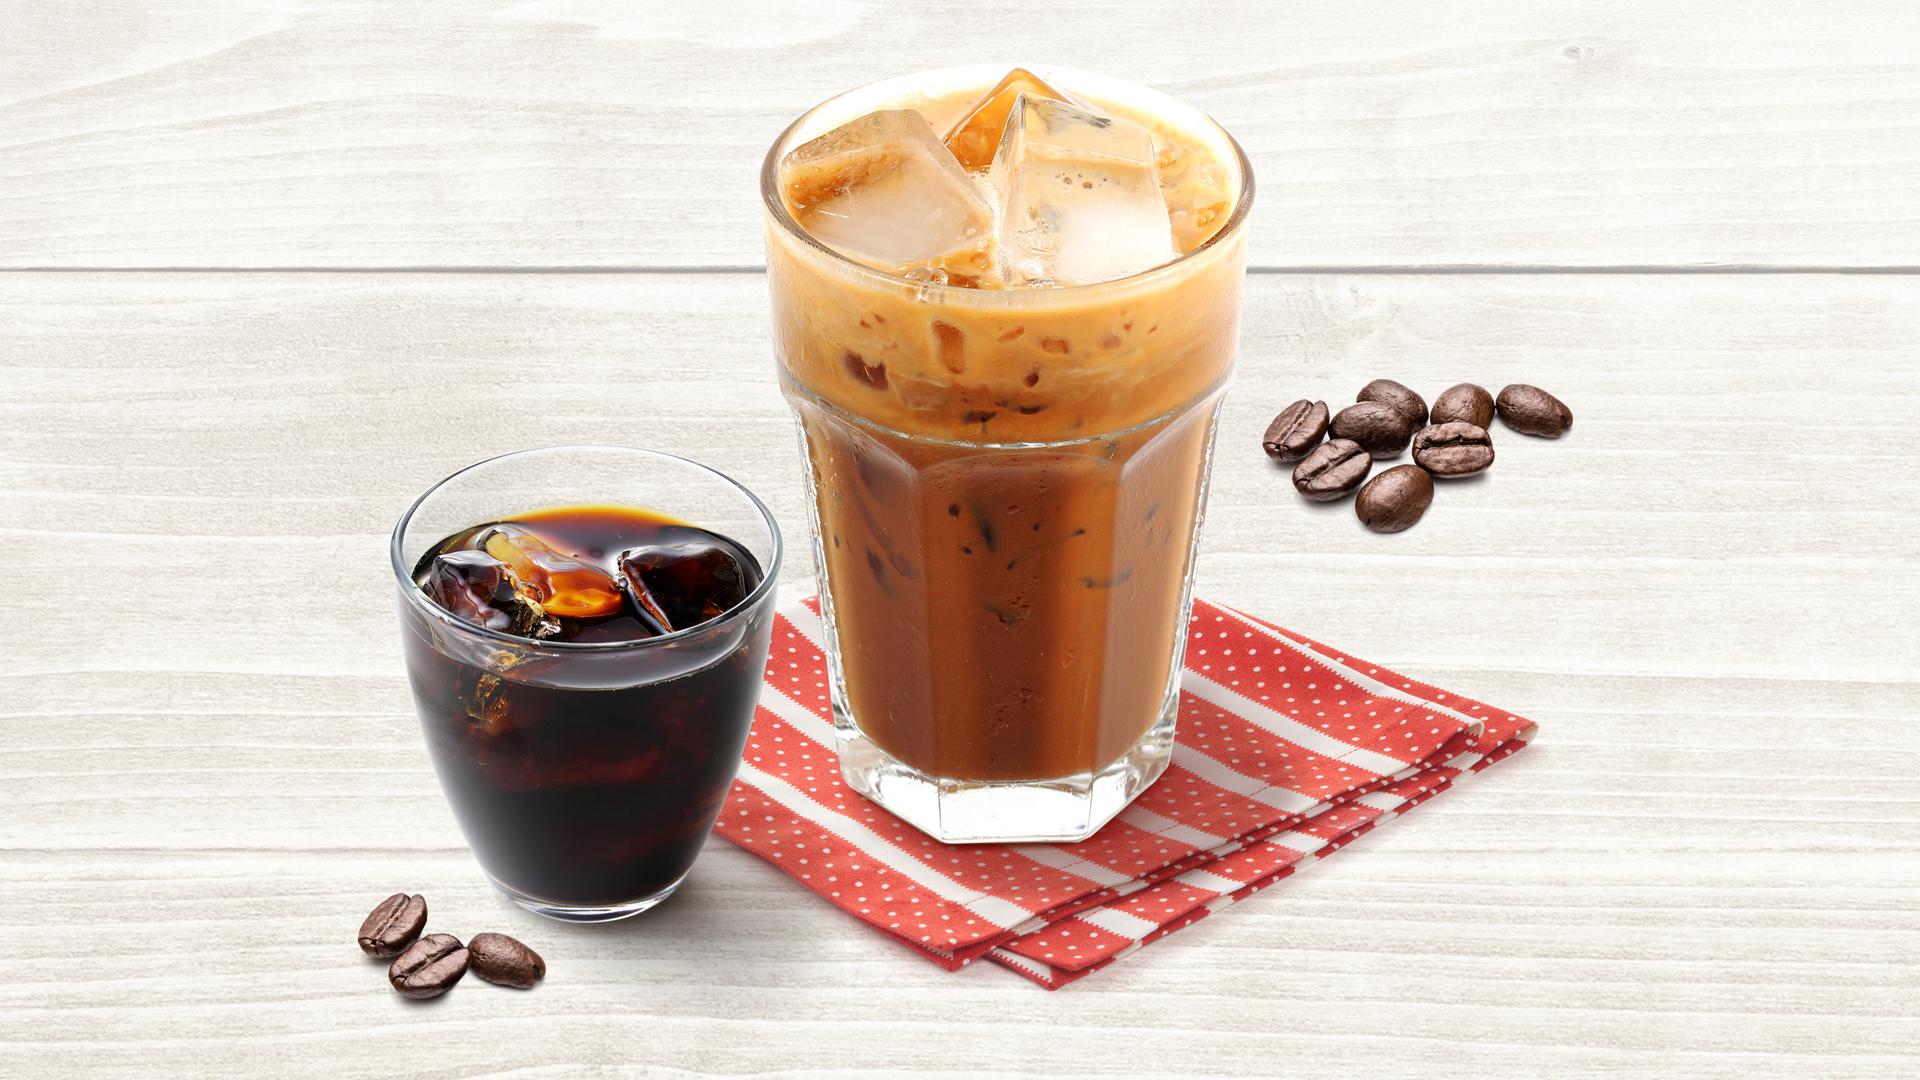 Kaffee auf Eis